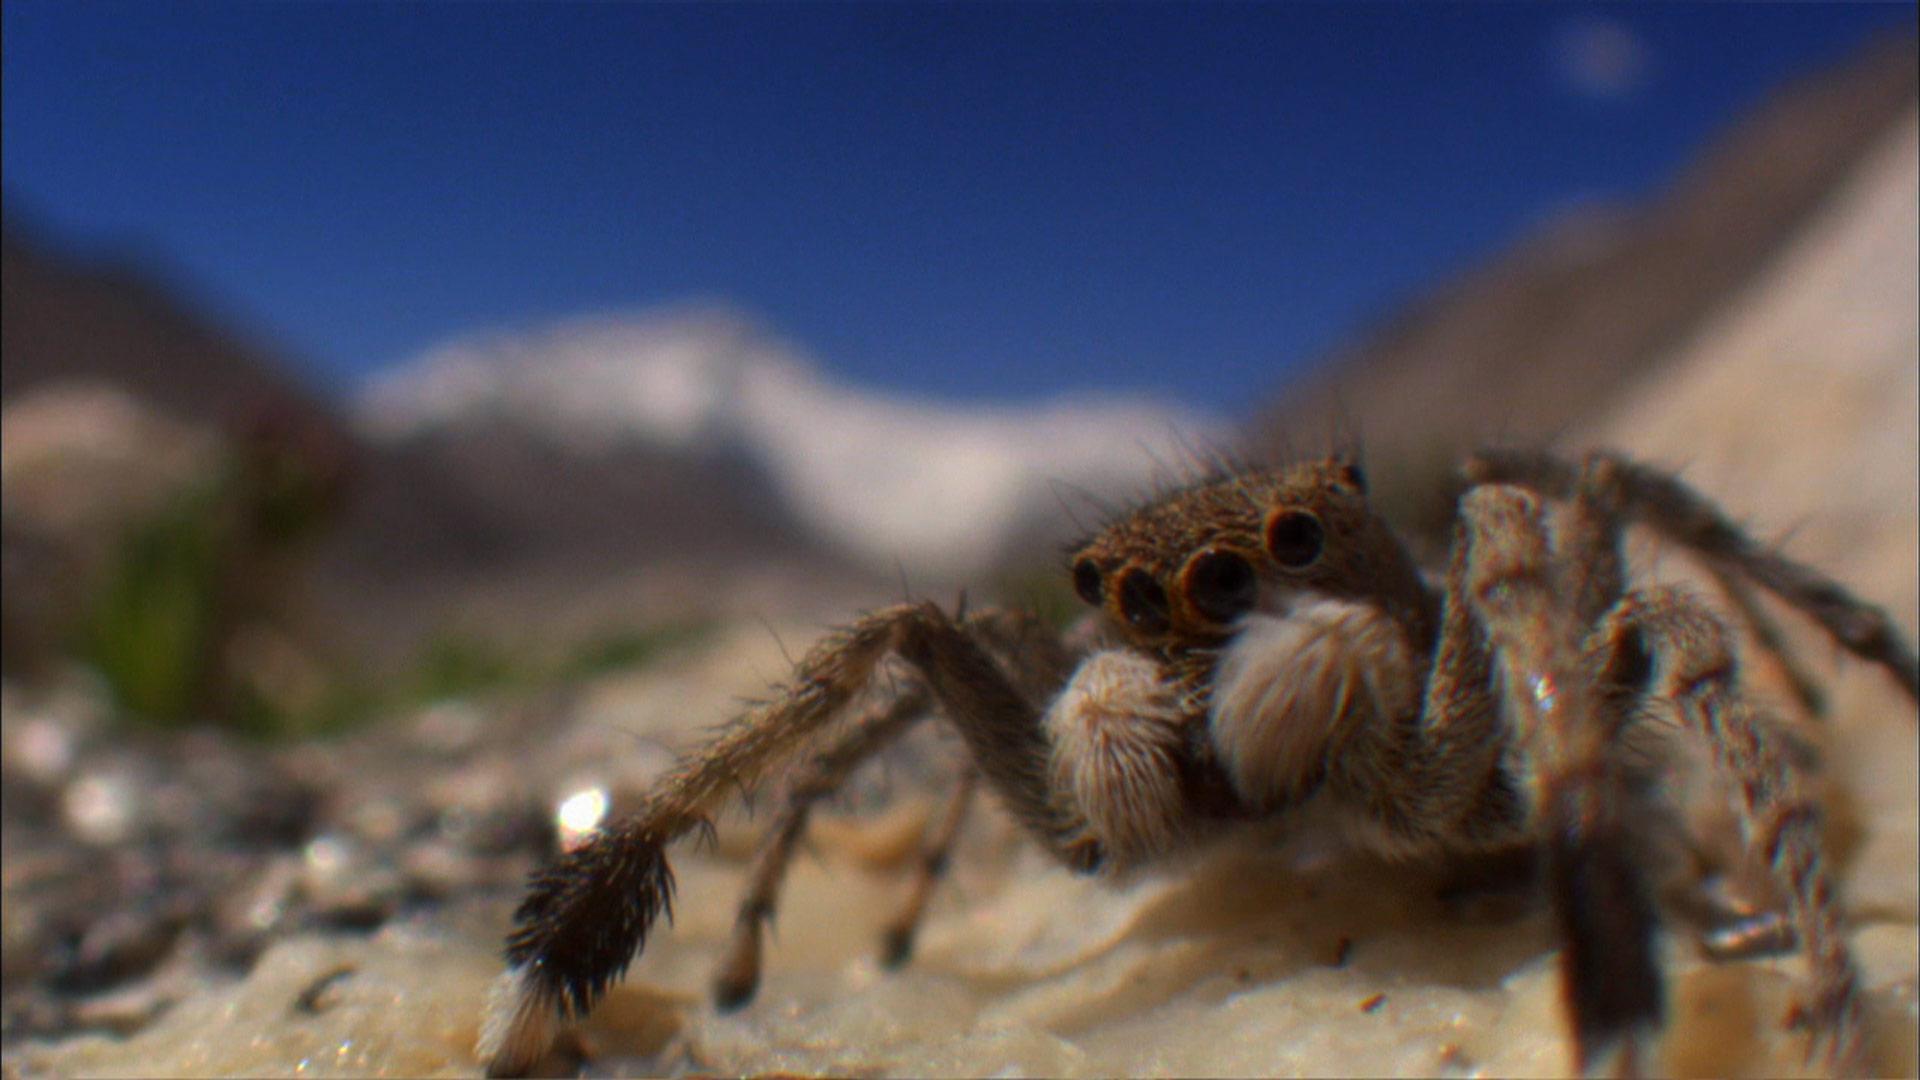 The Himalayas The Himalayan Jumping Spider Nature Pbs